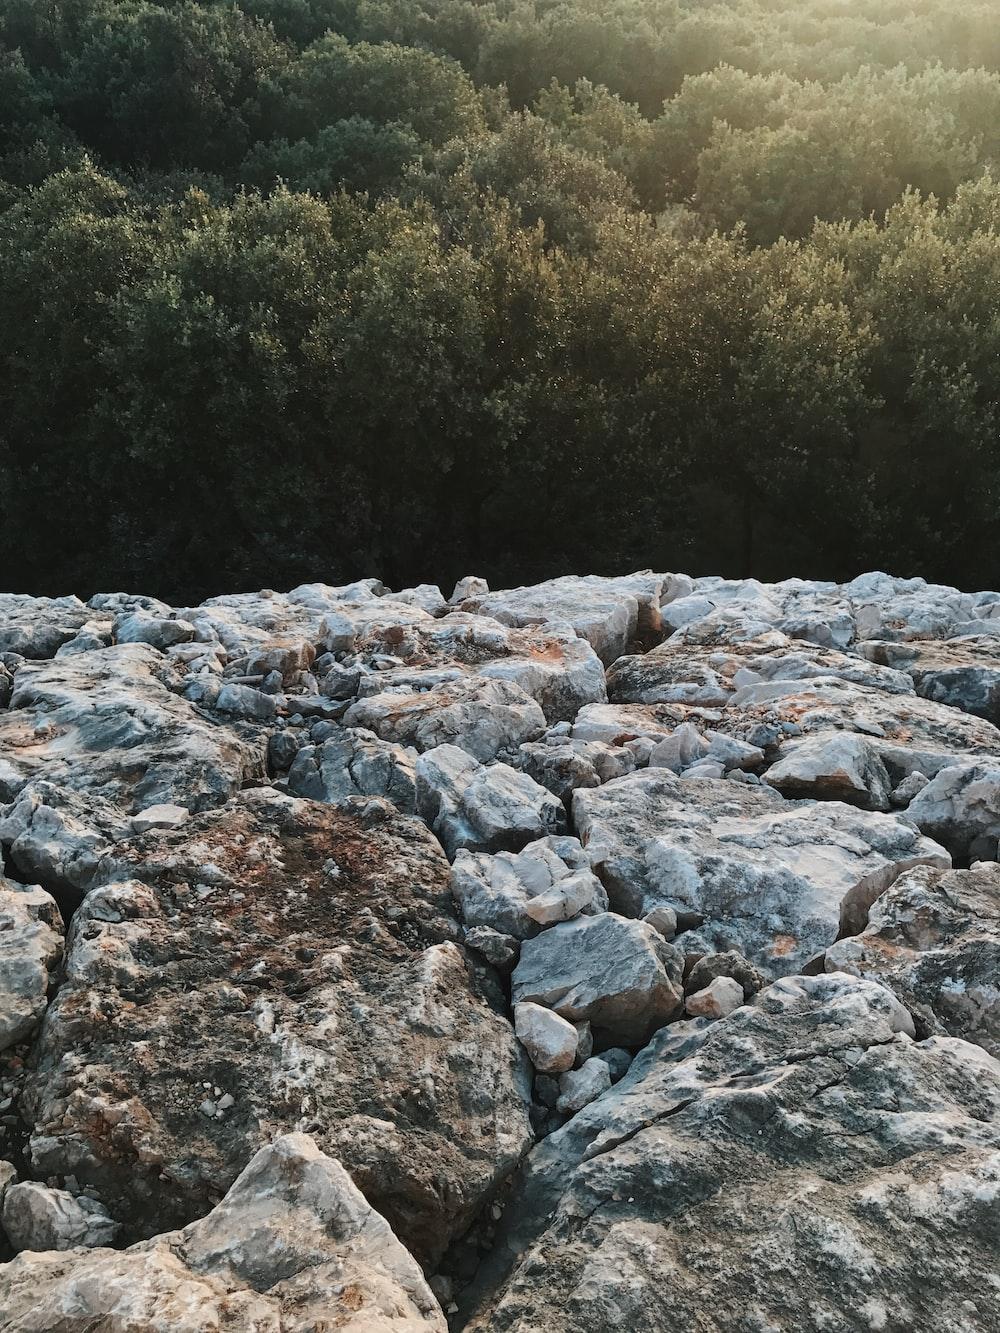 gray and brown rocks